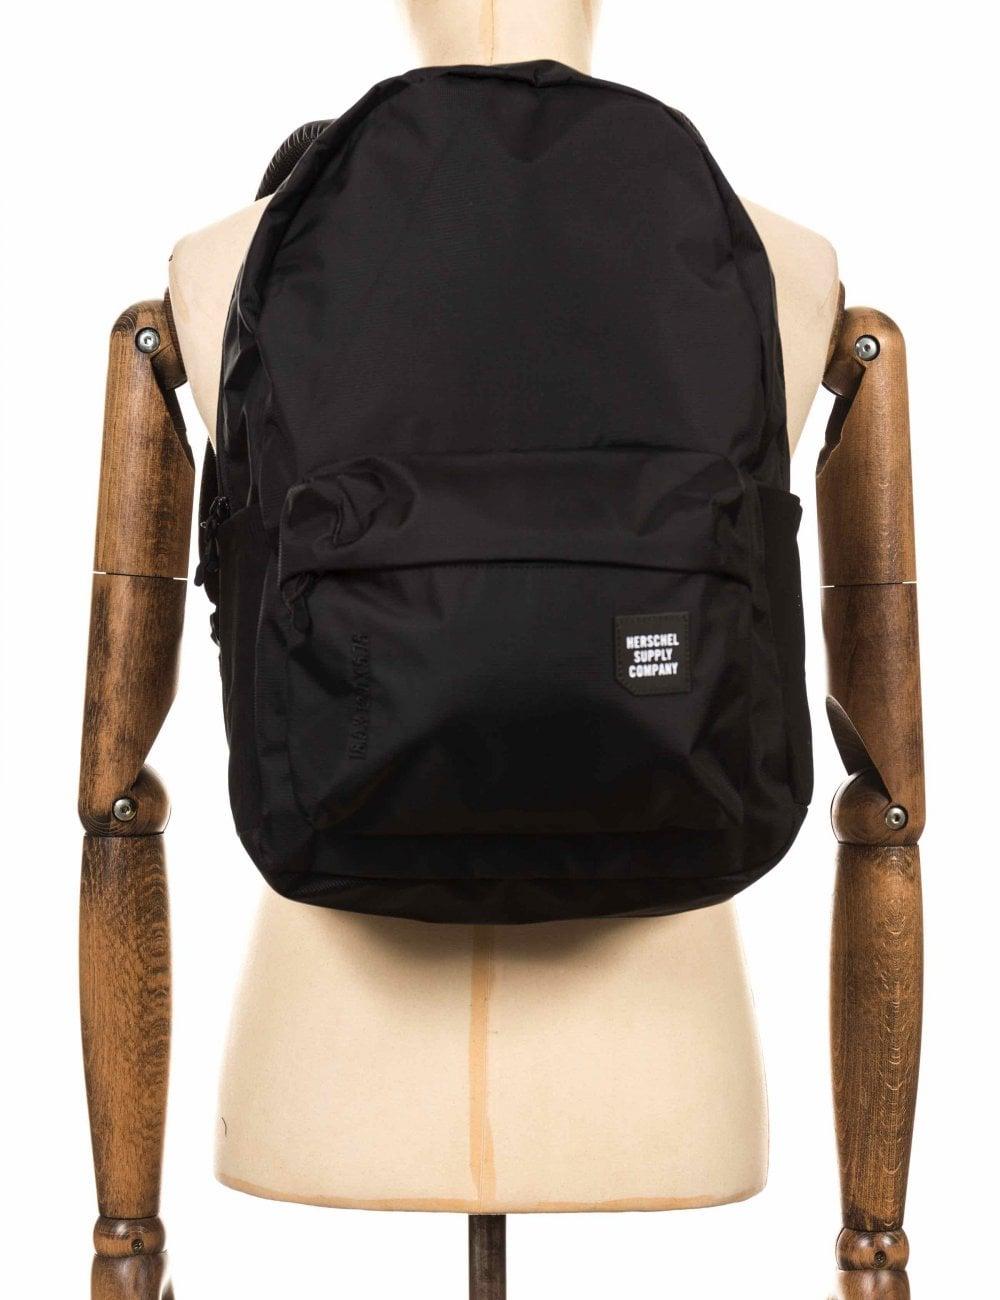 6758fce3a Herschel Supply Co Rundle Trail Backpack 24.5L - Black - Bag Shop ...